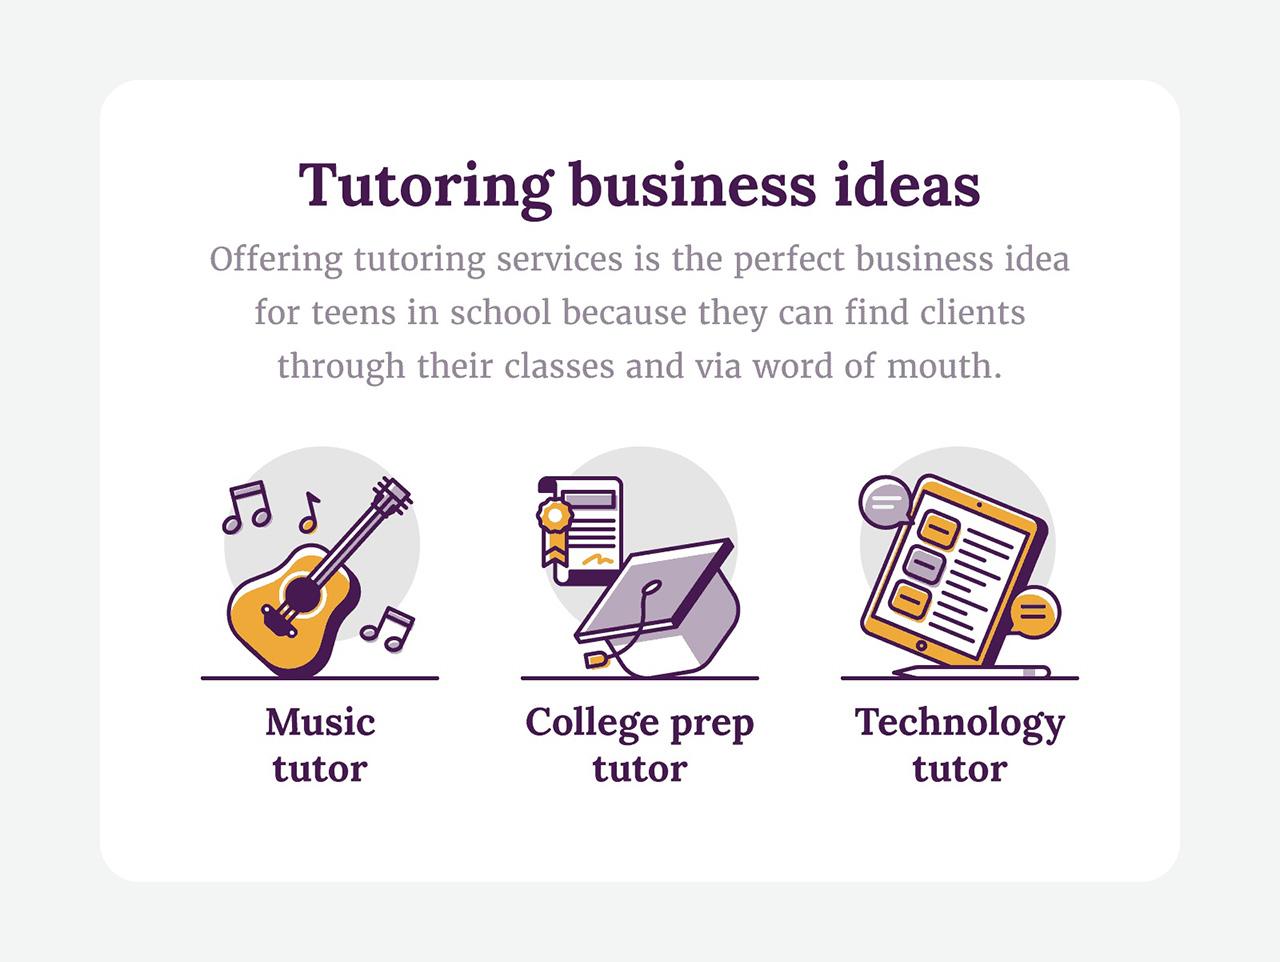 Tutoring business ideas like music, college prep or technology tutoring